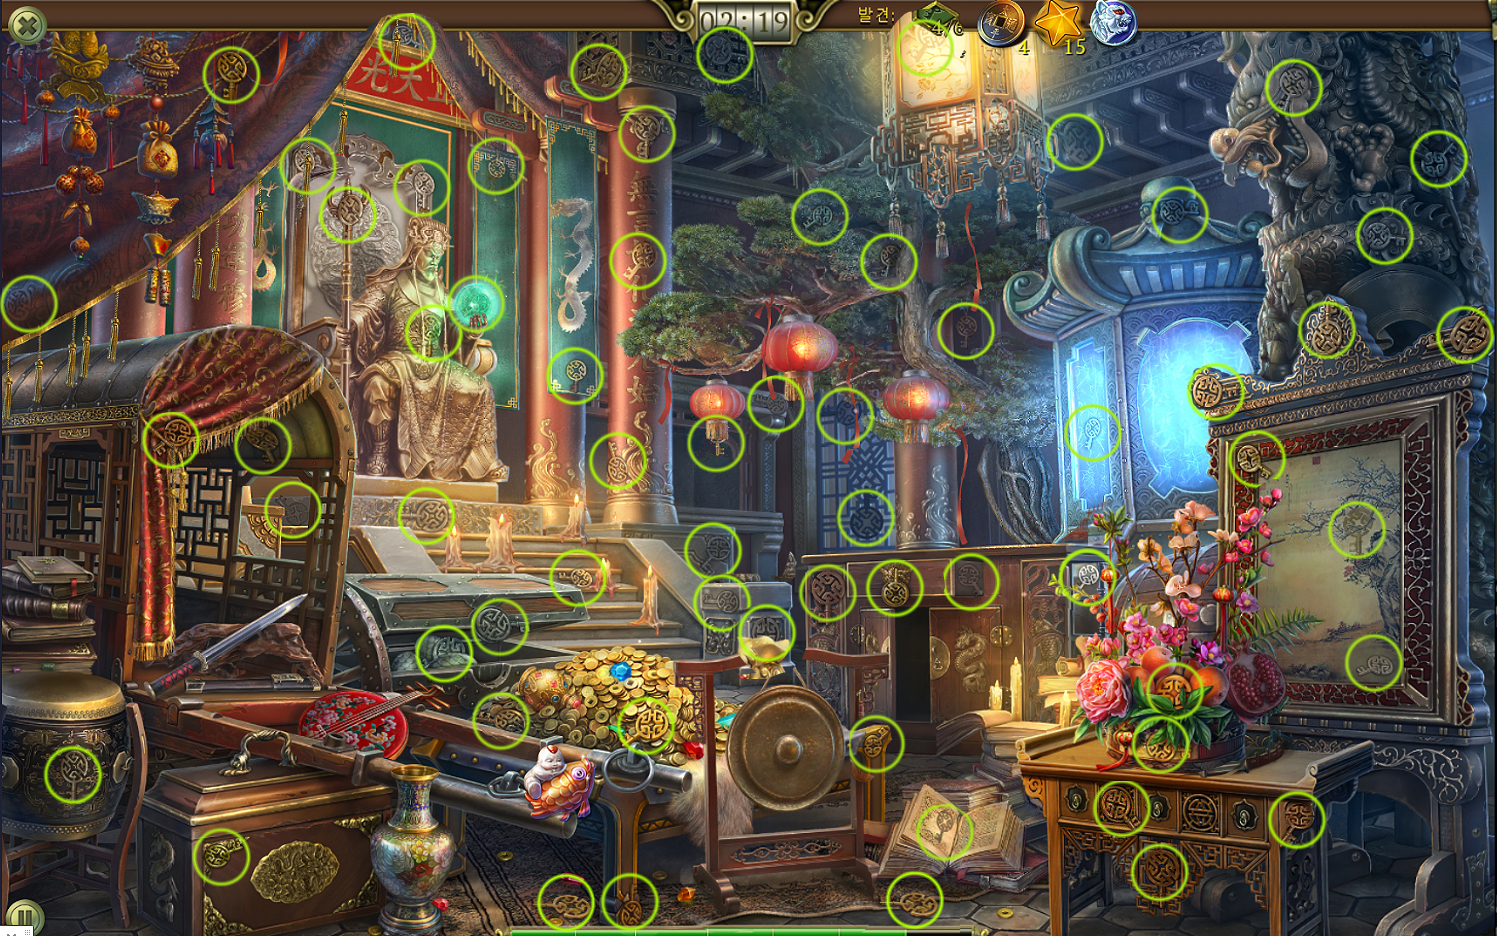 hidden city hidden object game how to change levels